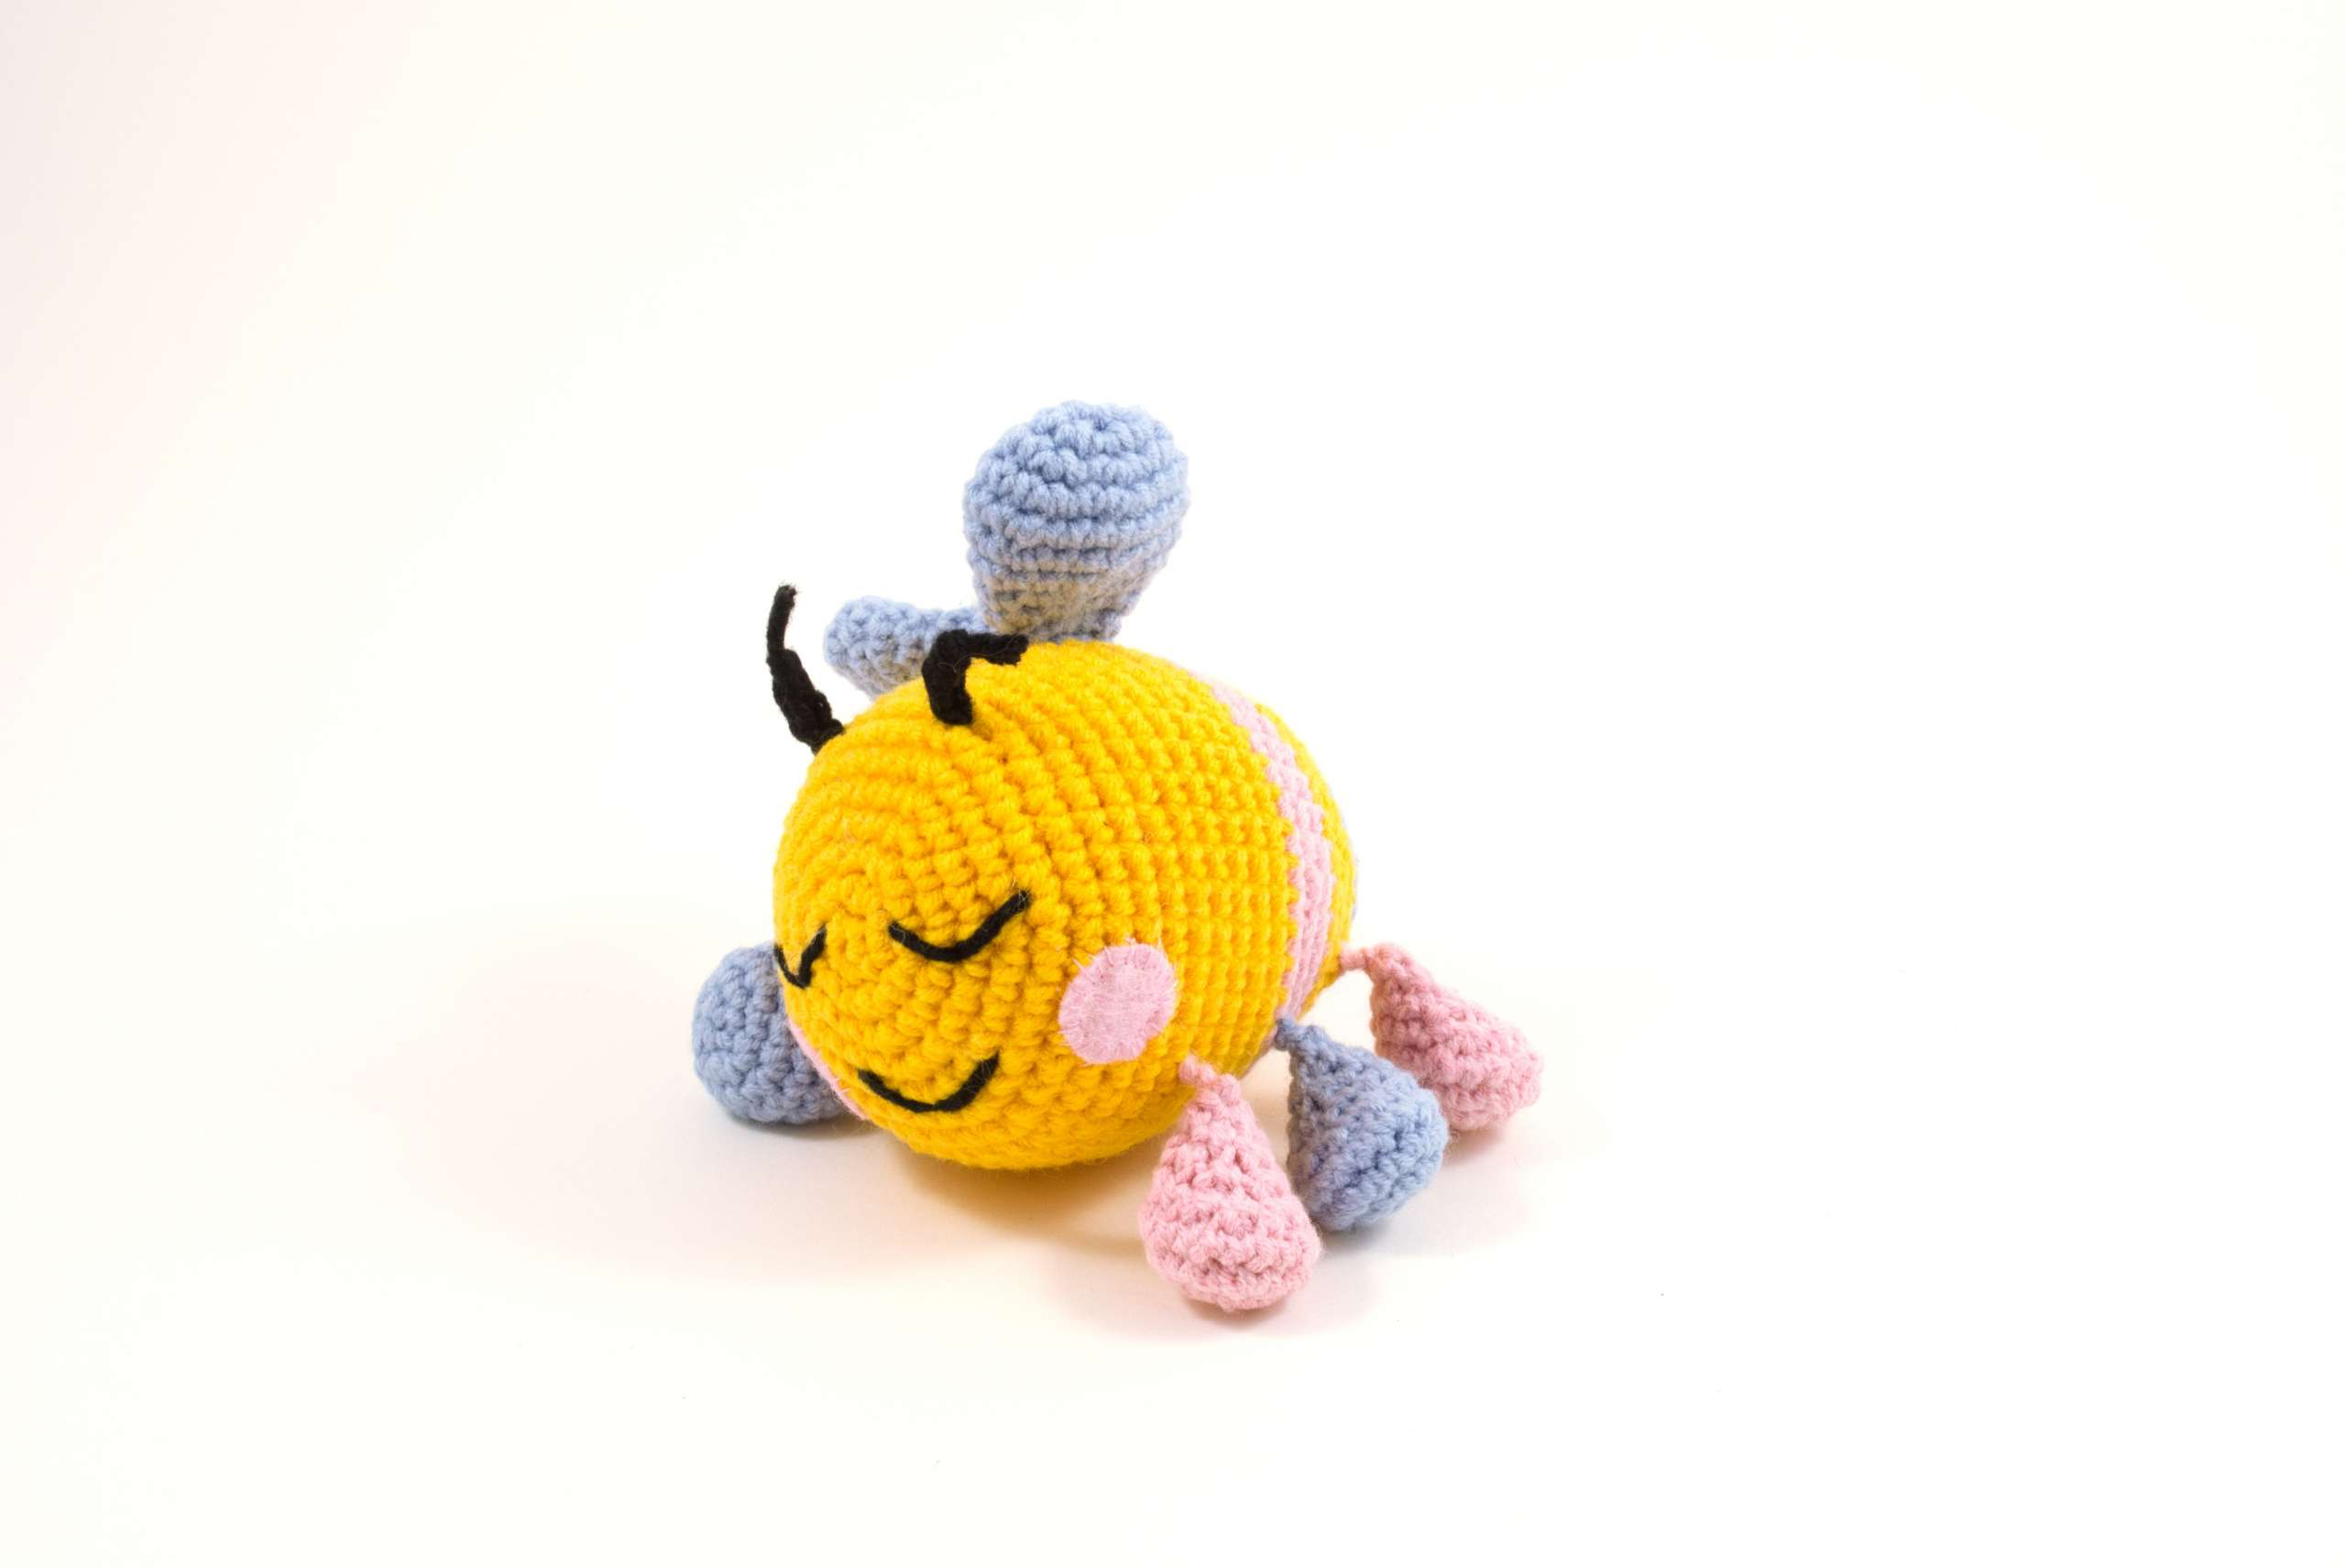 crochet bibi the bee side view